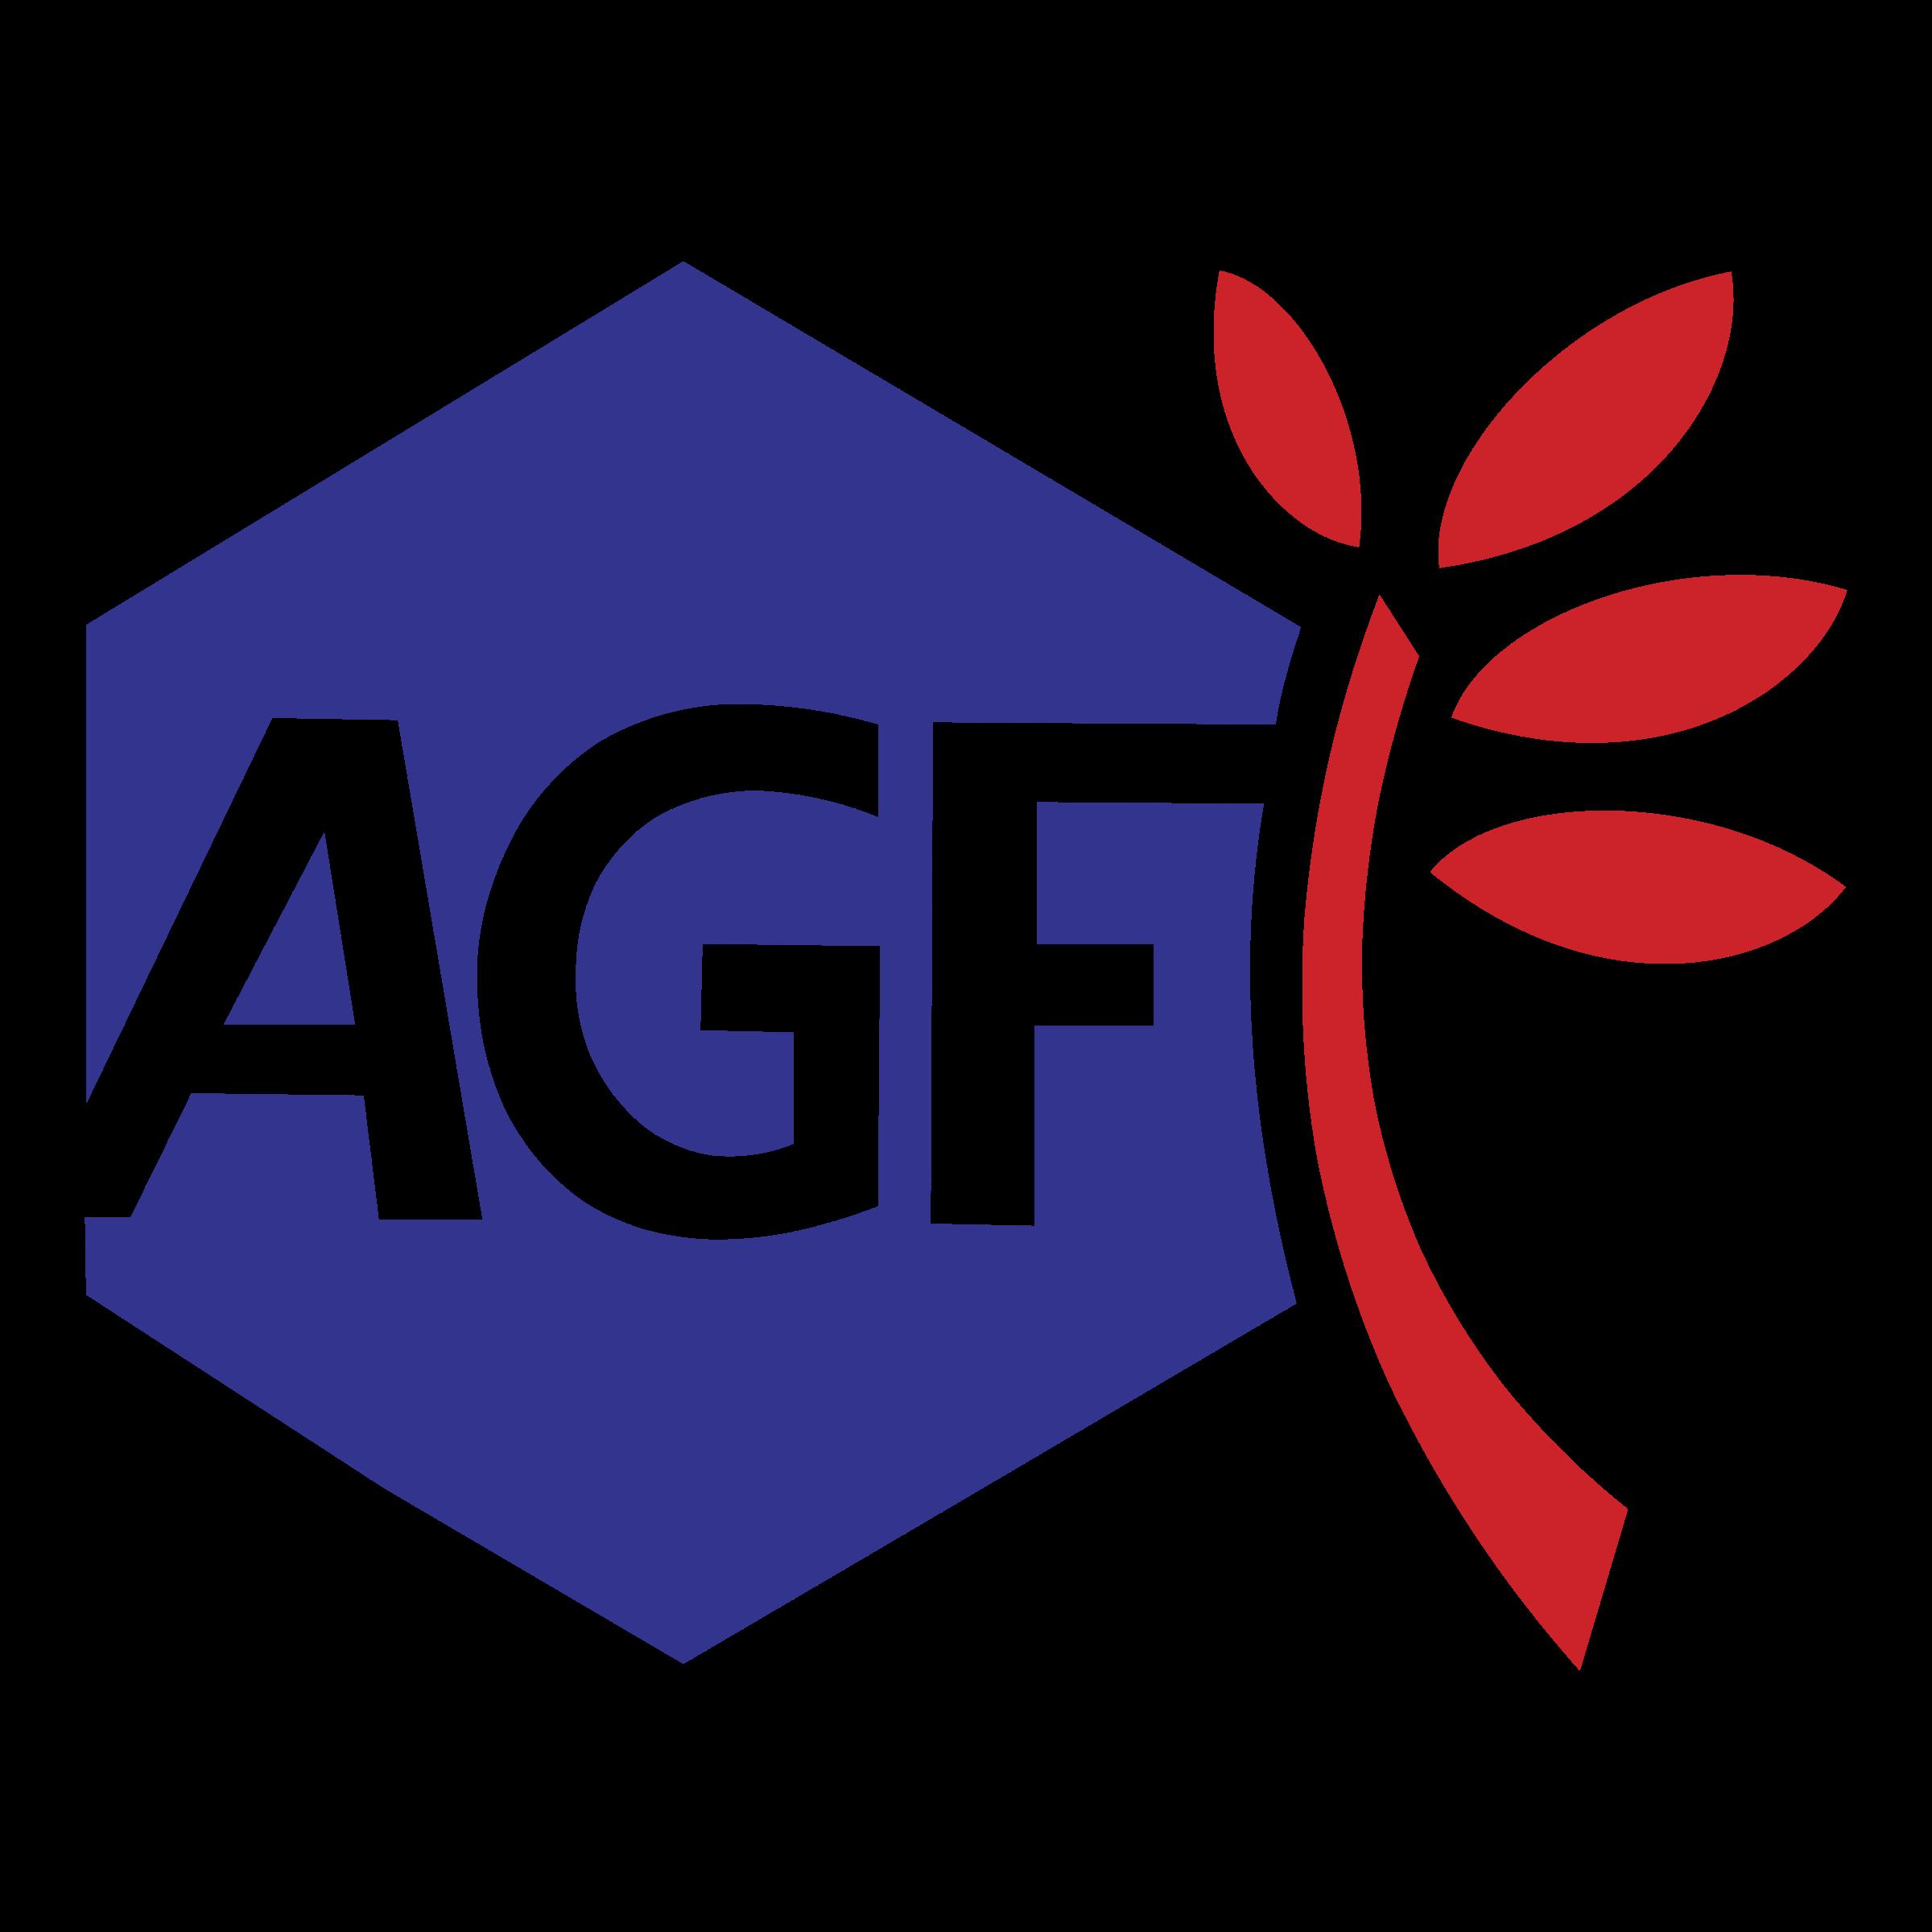 AGF Logo PNG Transparent & SVG Vector.